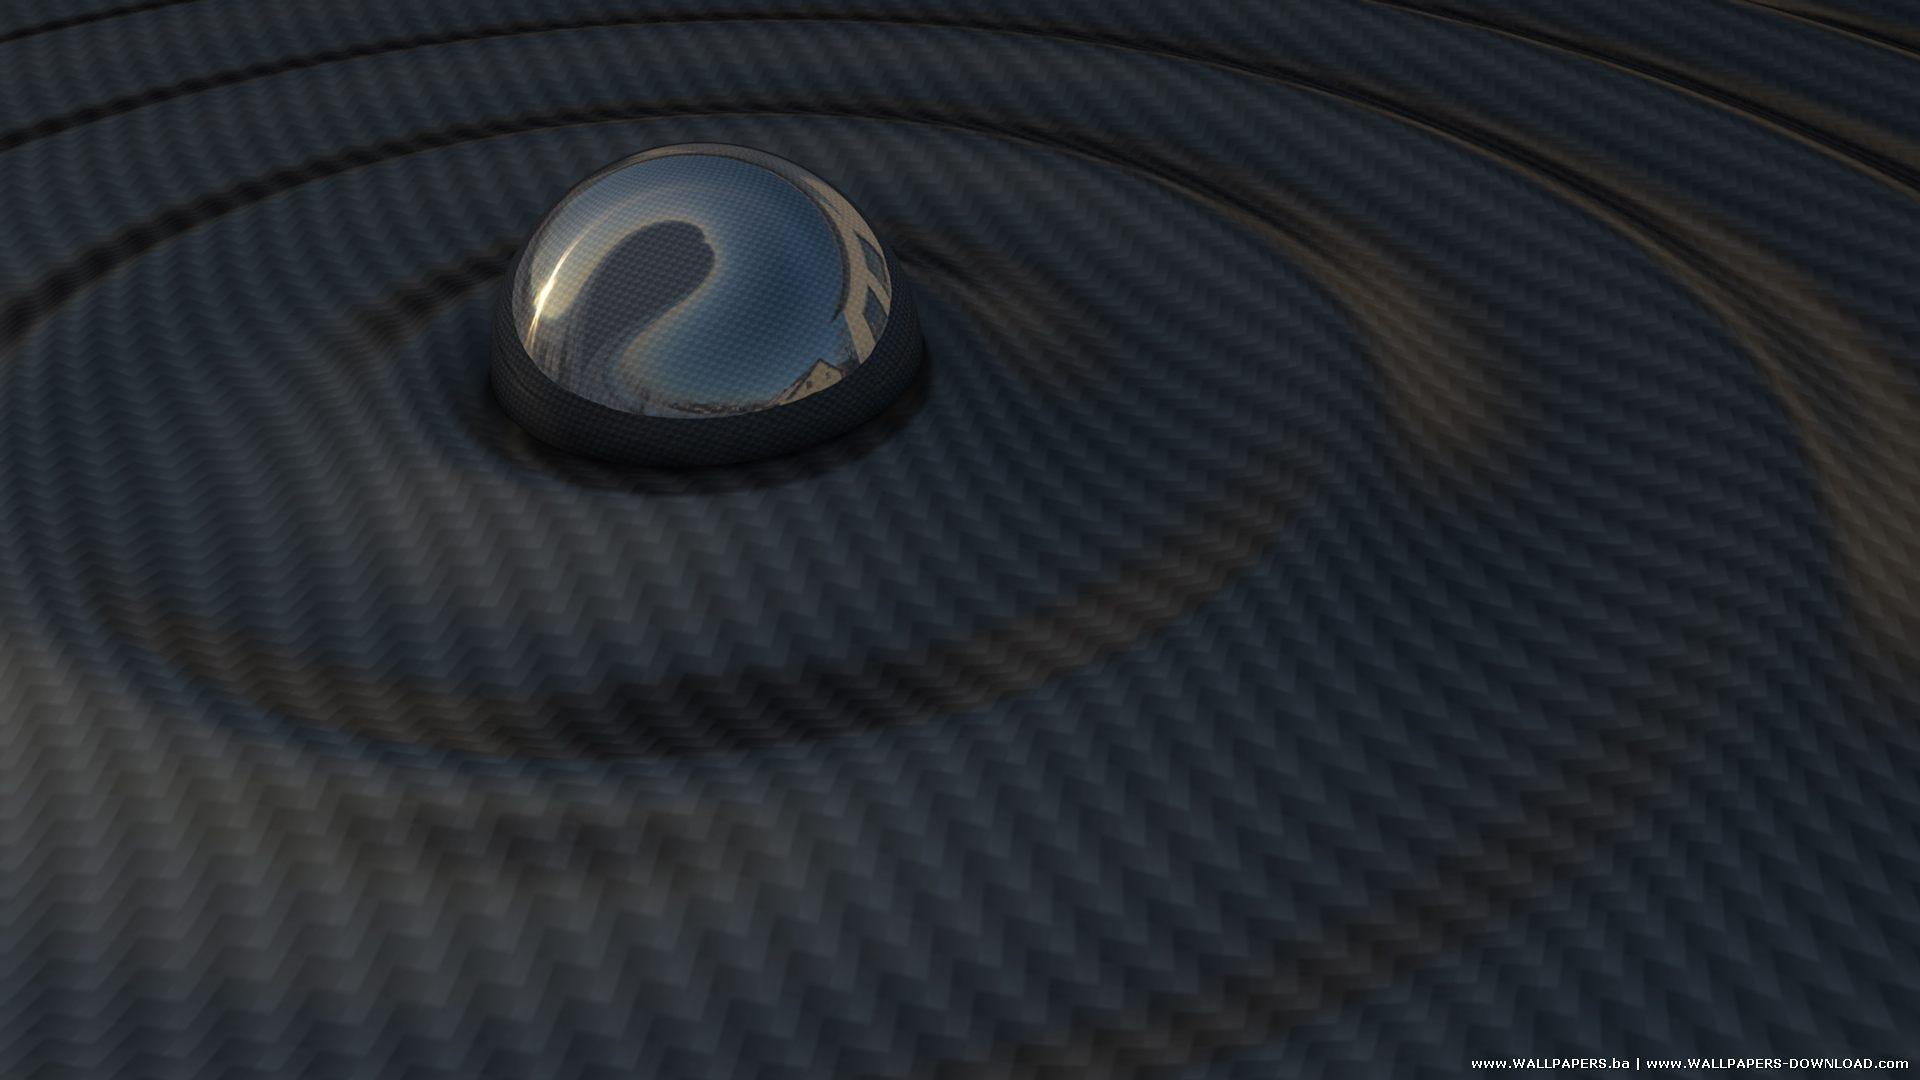 Carbon Ripple Abstract Rare HD Wallpaper